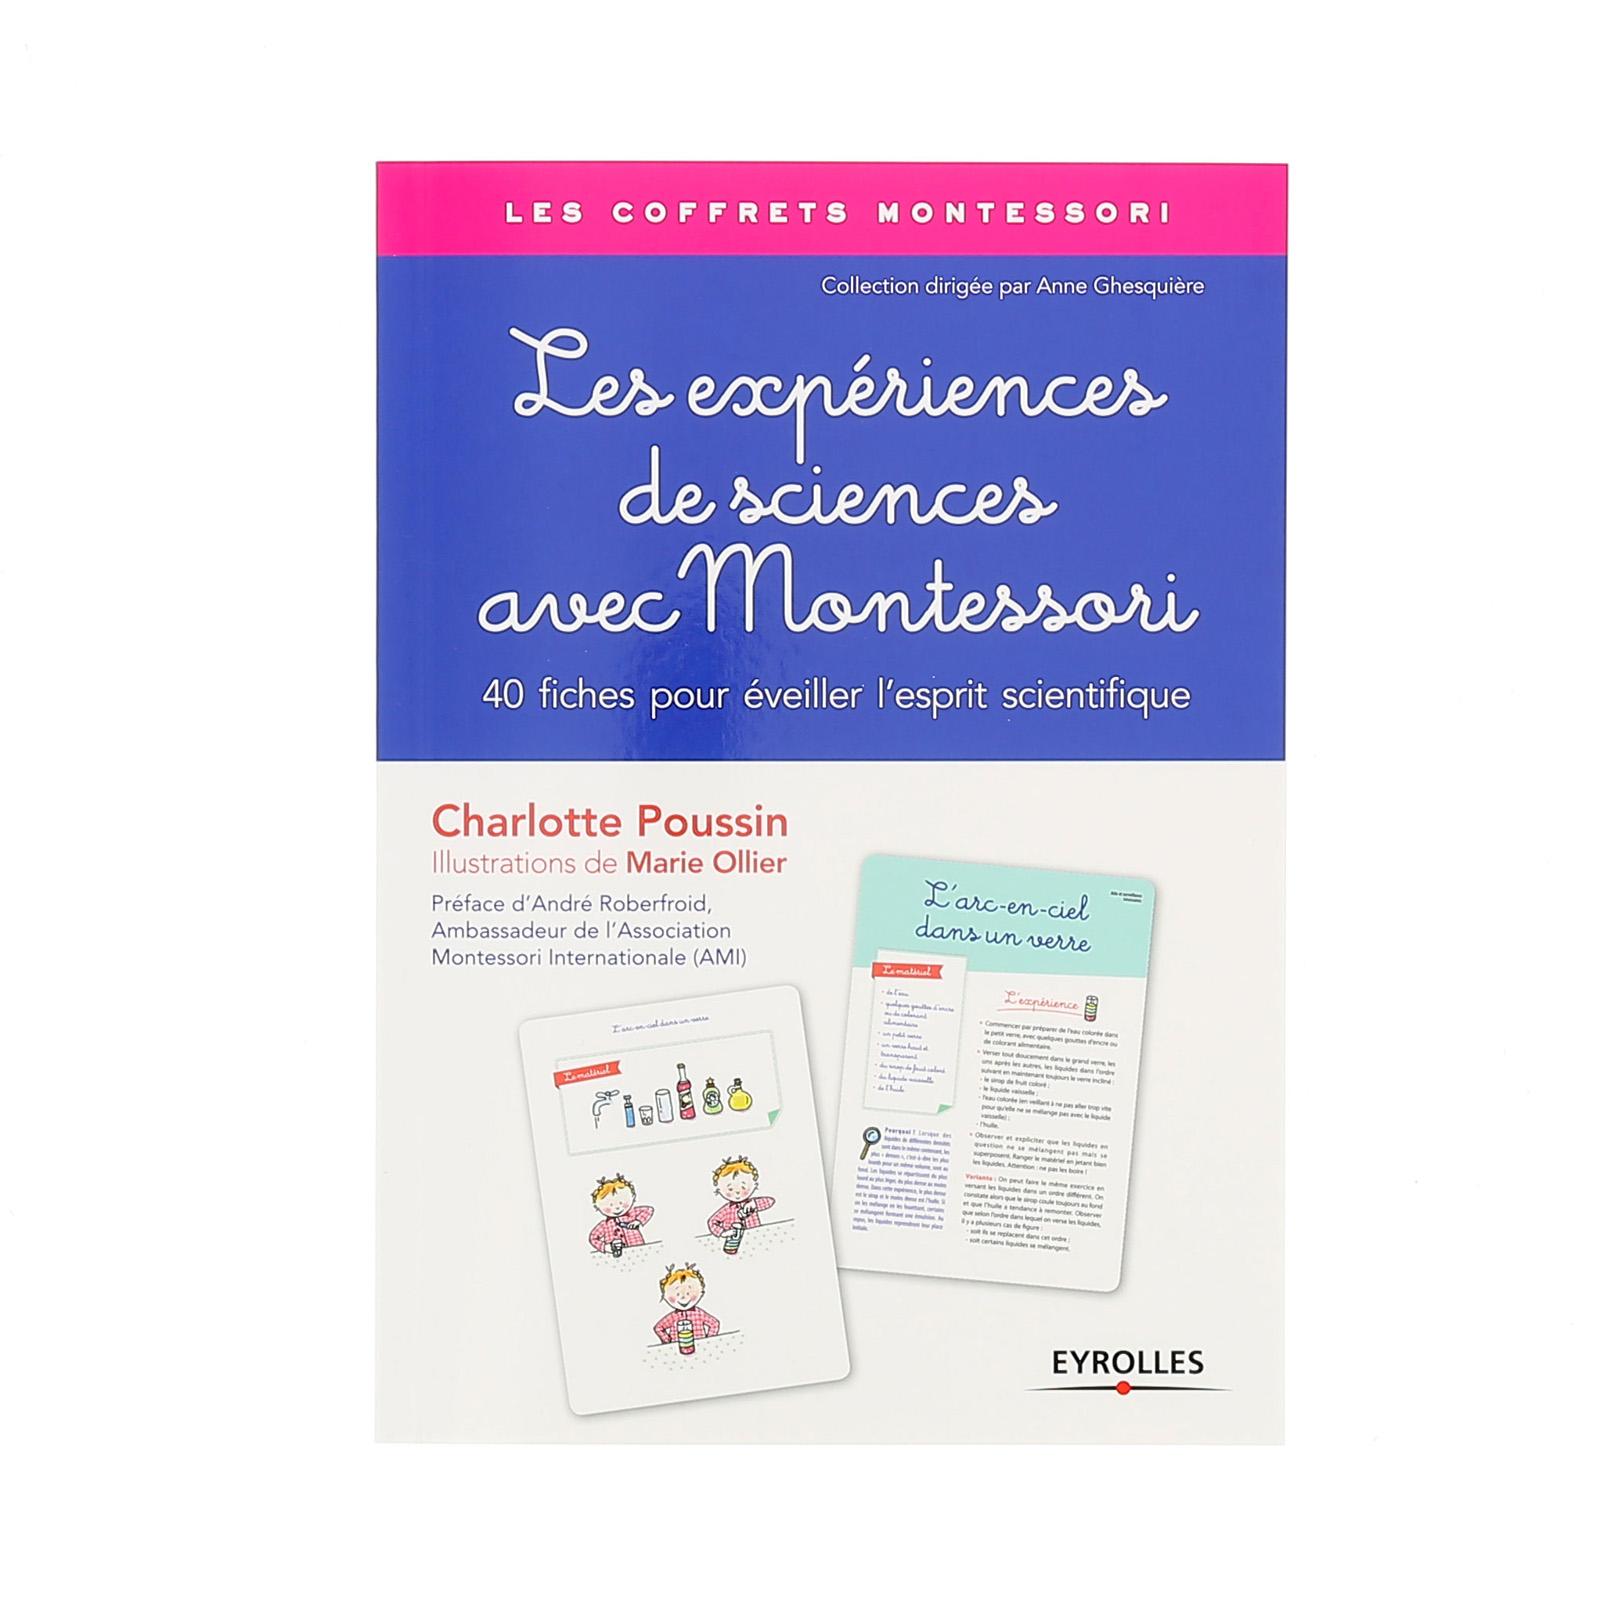 Les Expériences Expériences Des Les Sciences Les Des Sciences Expériences SzMUVpq